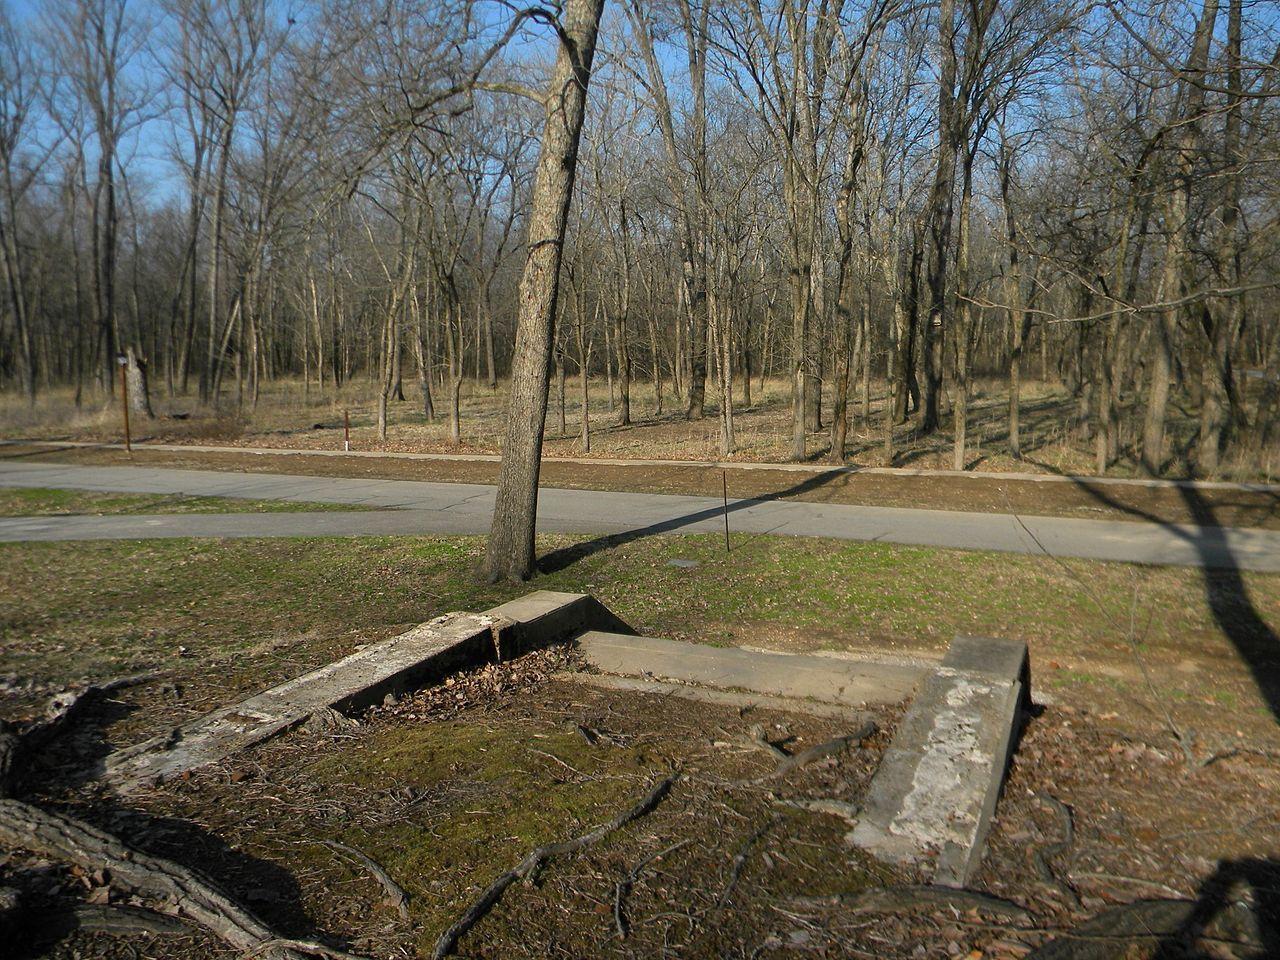 Old Greenville (23WE637) in Wayne County, Missouri.